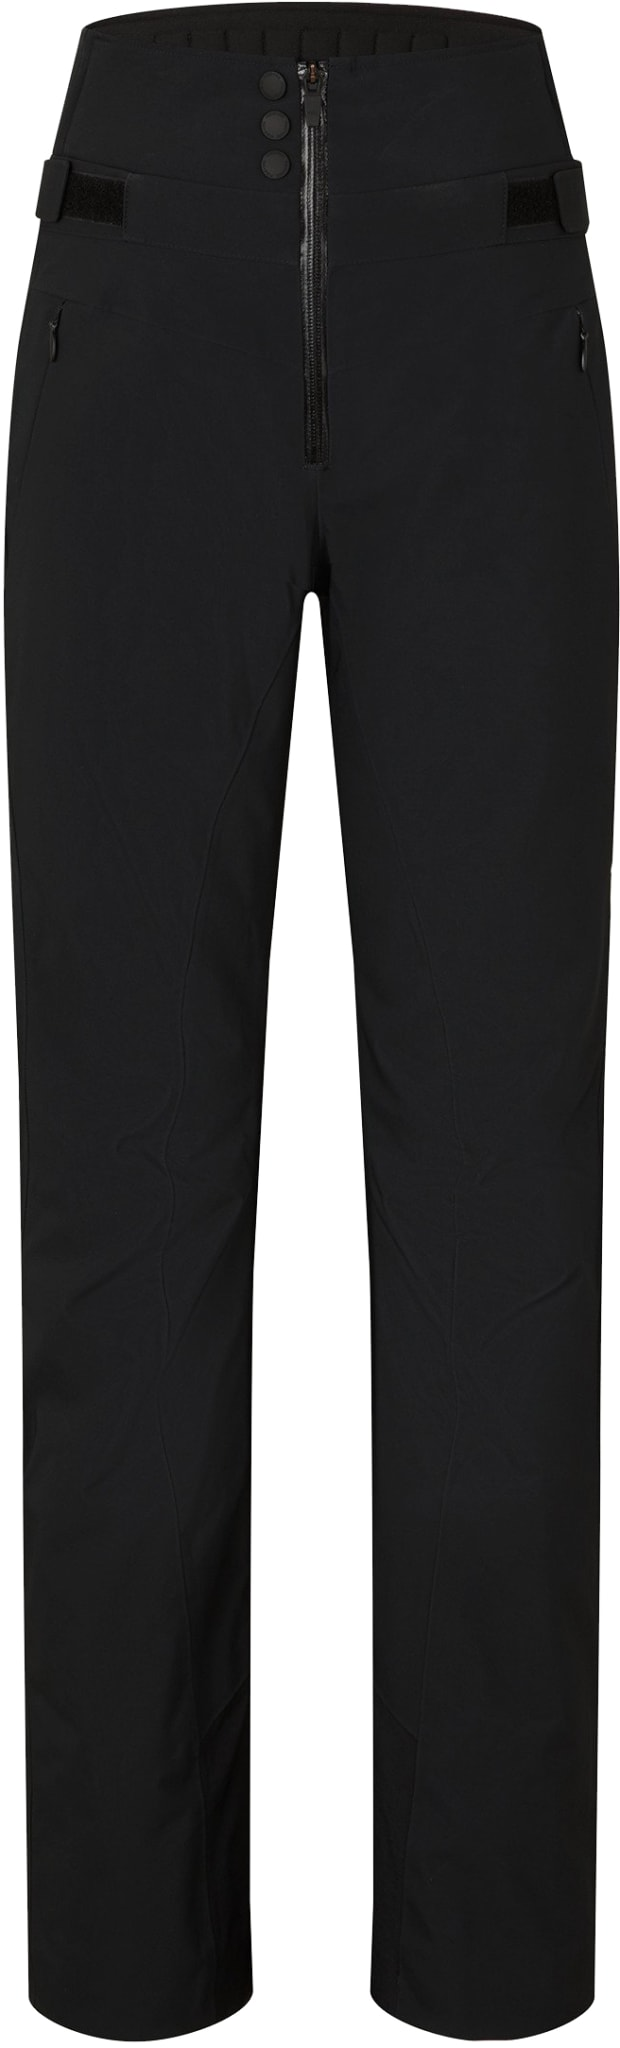 Borja Ski Pants W